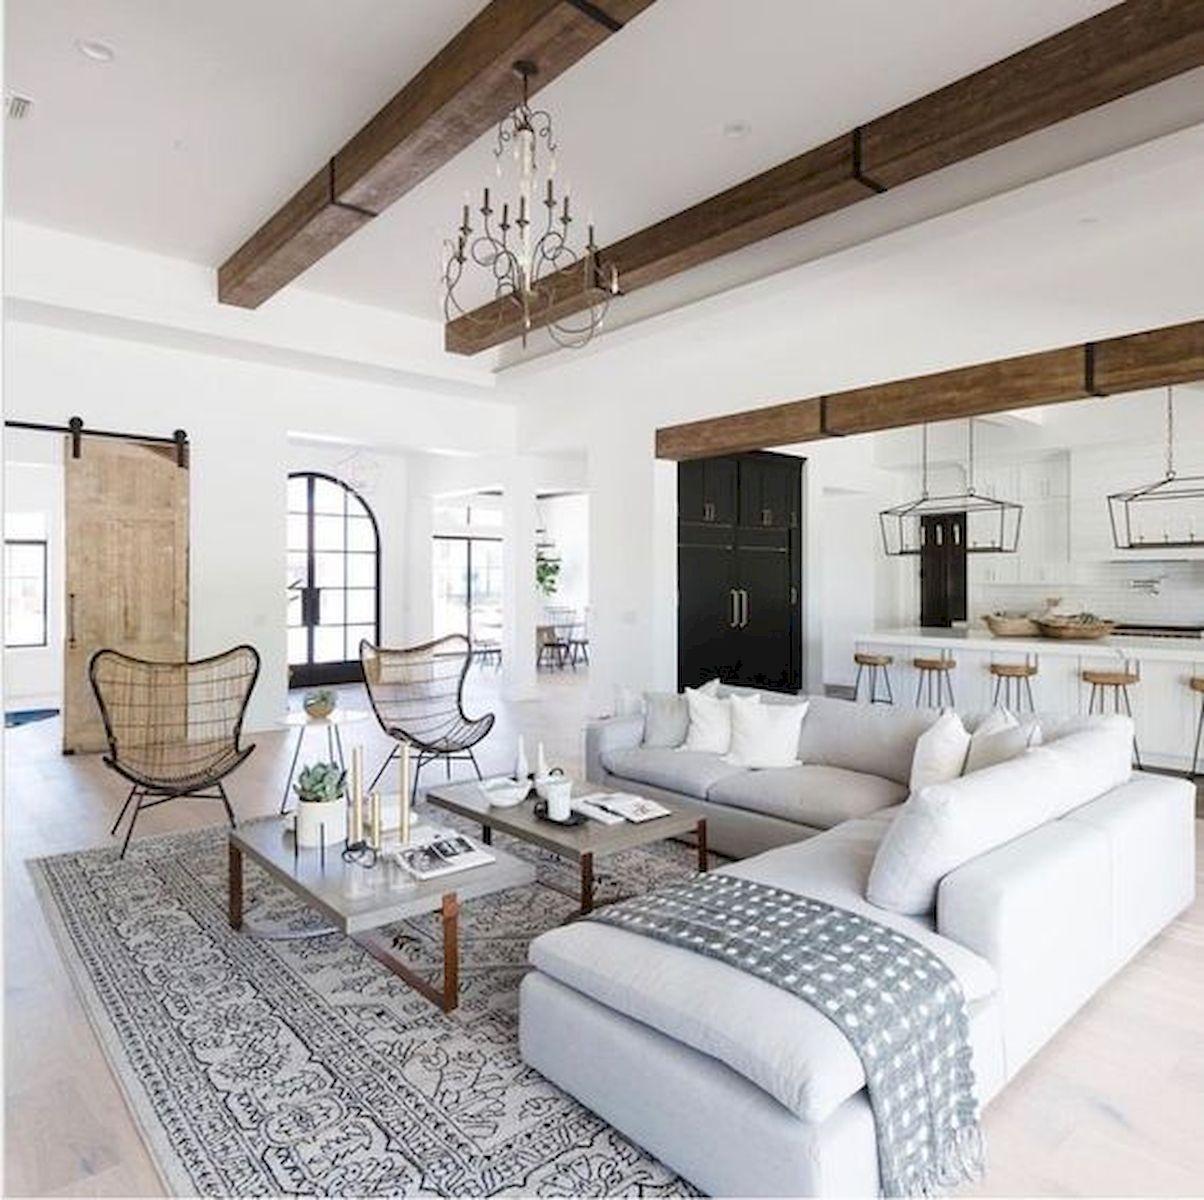 33 Stunning Farmhouse Living Room Lamps Design Ideas And Decor33DECOR